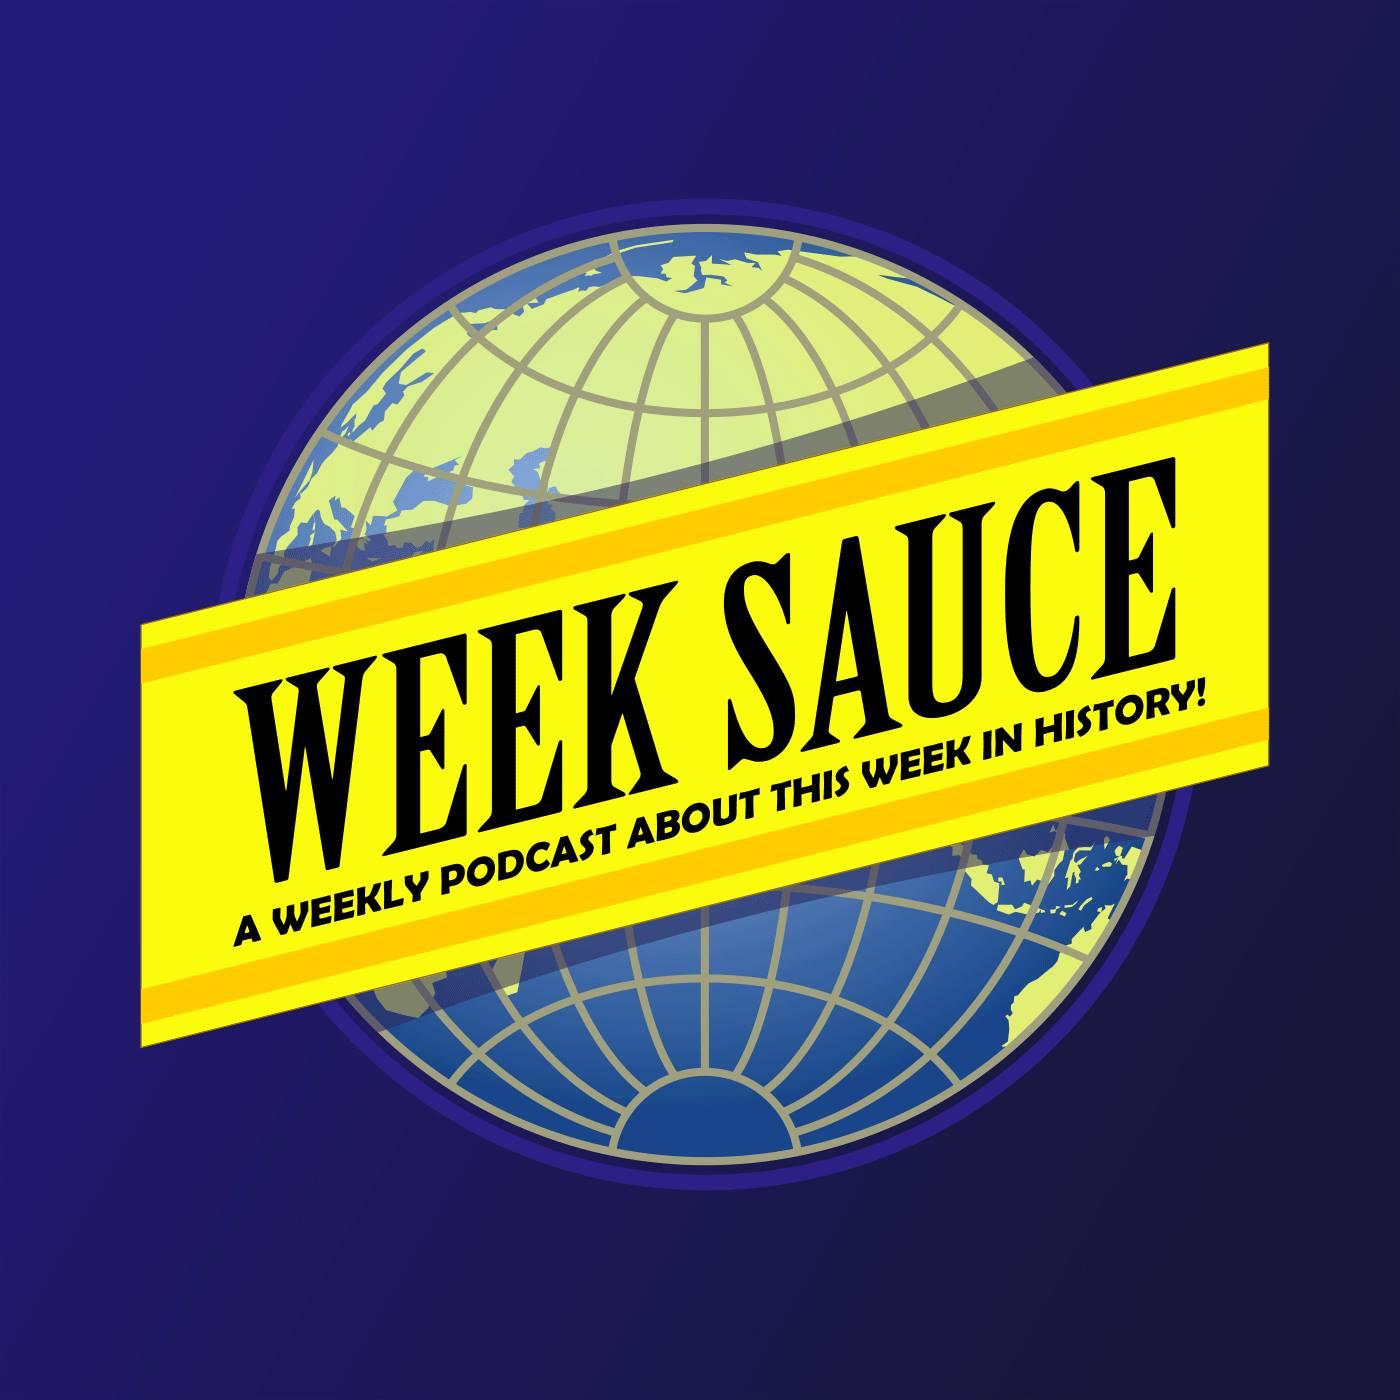 Week Sauce